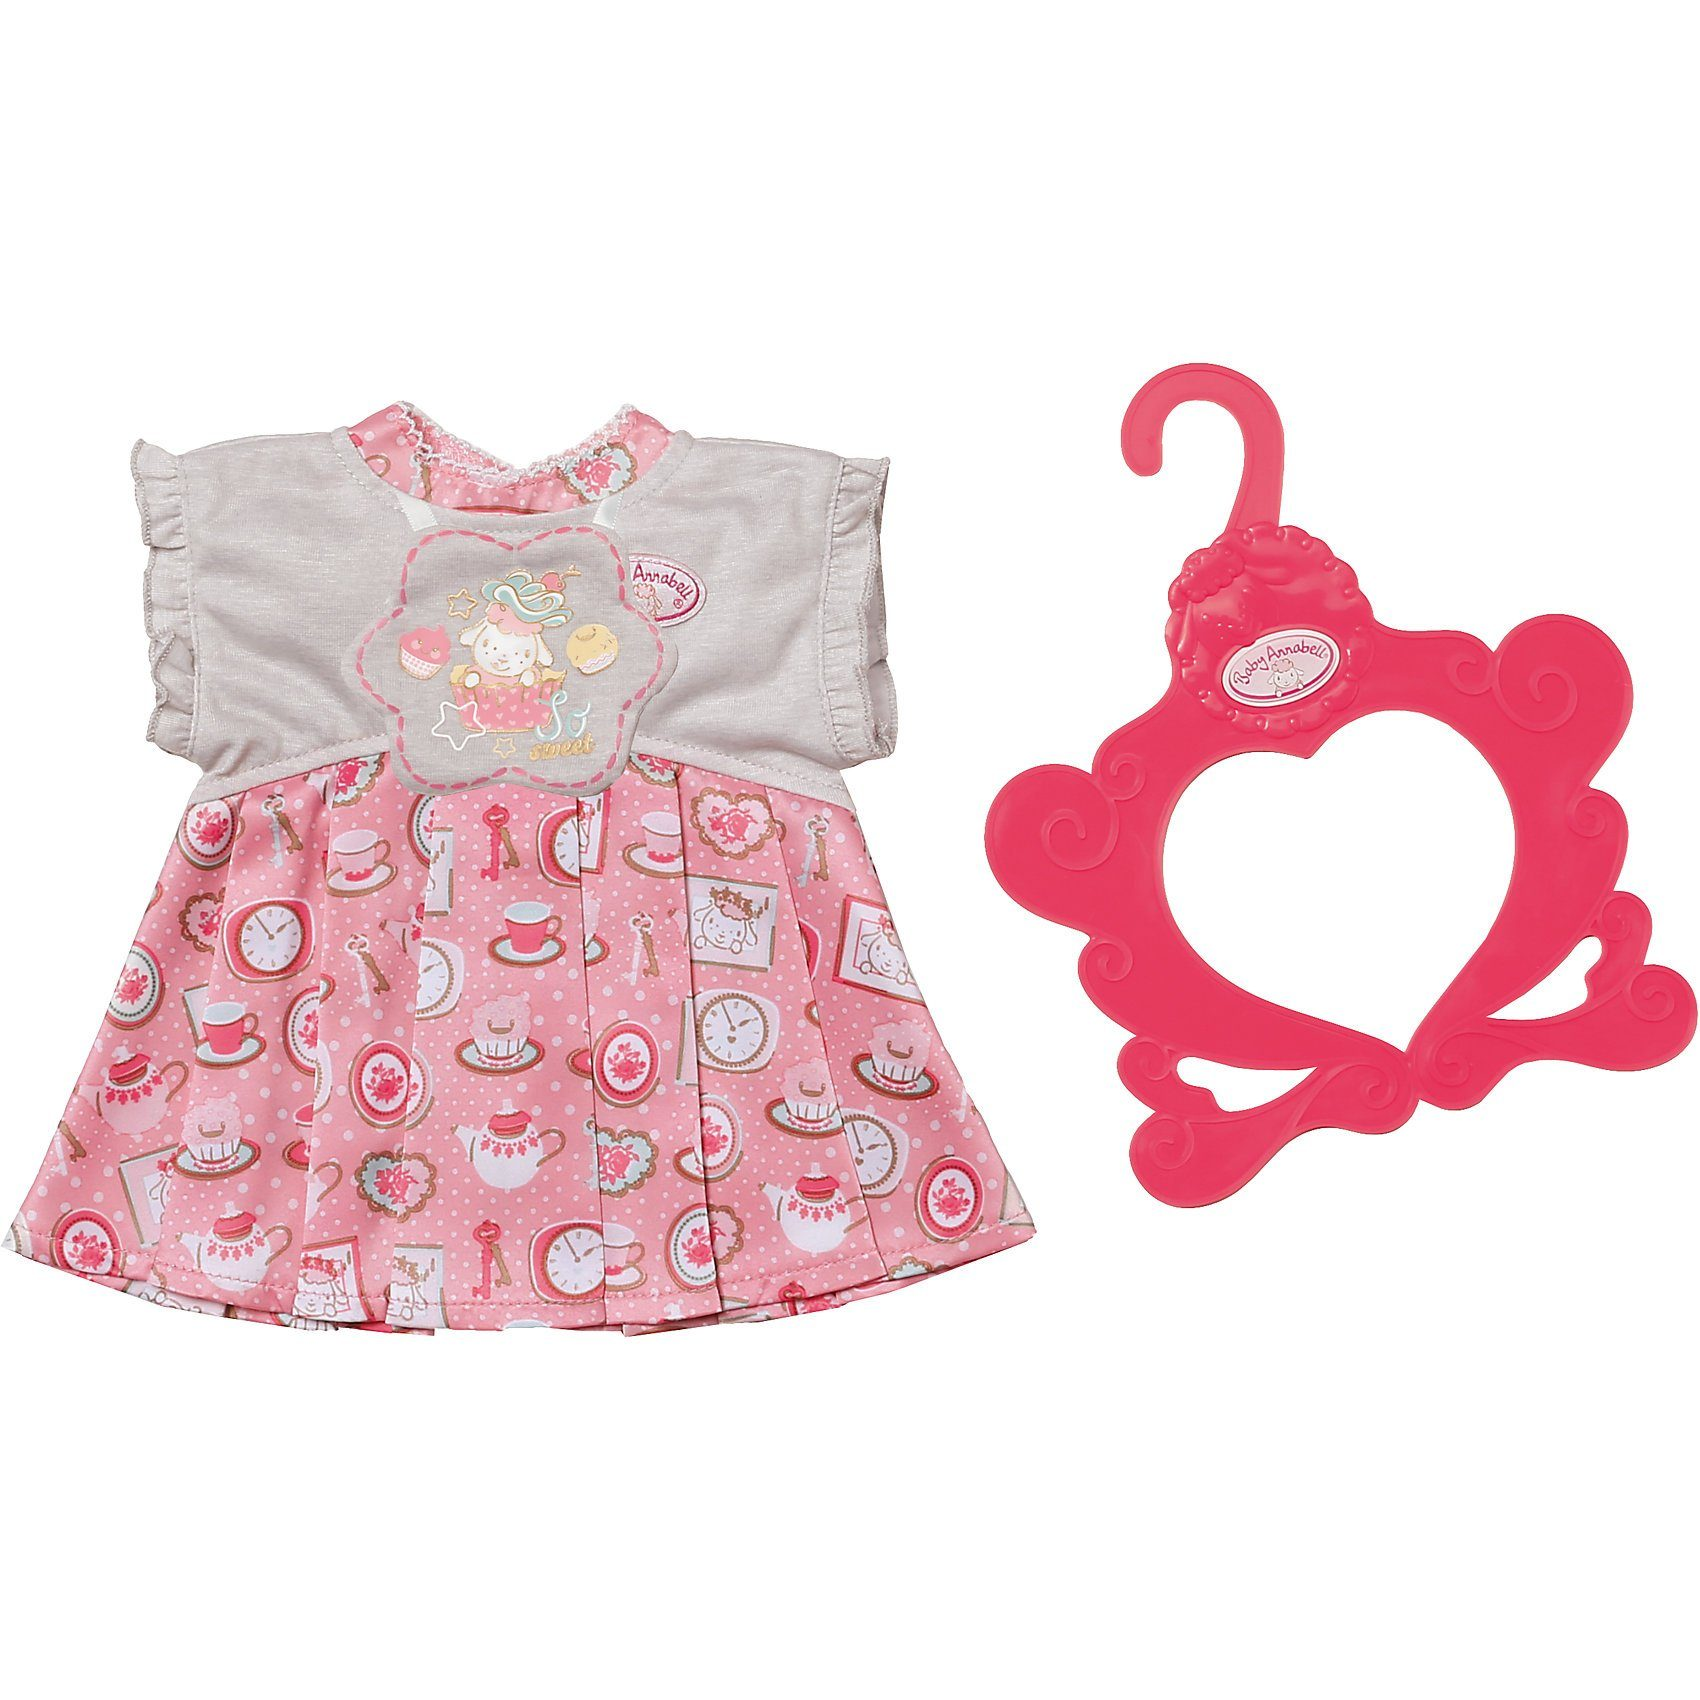 Zapf Creation® Baby Annabell® Kleid, grau/rosa